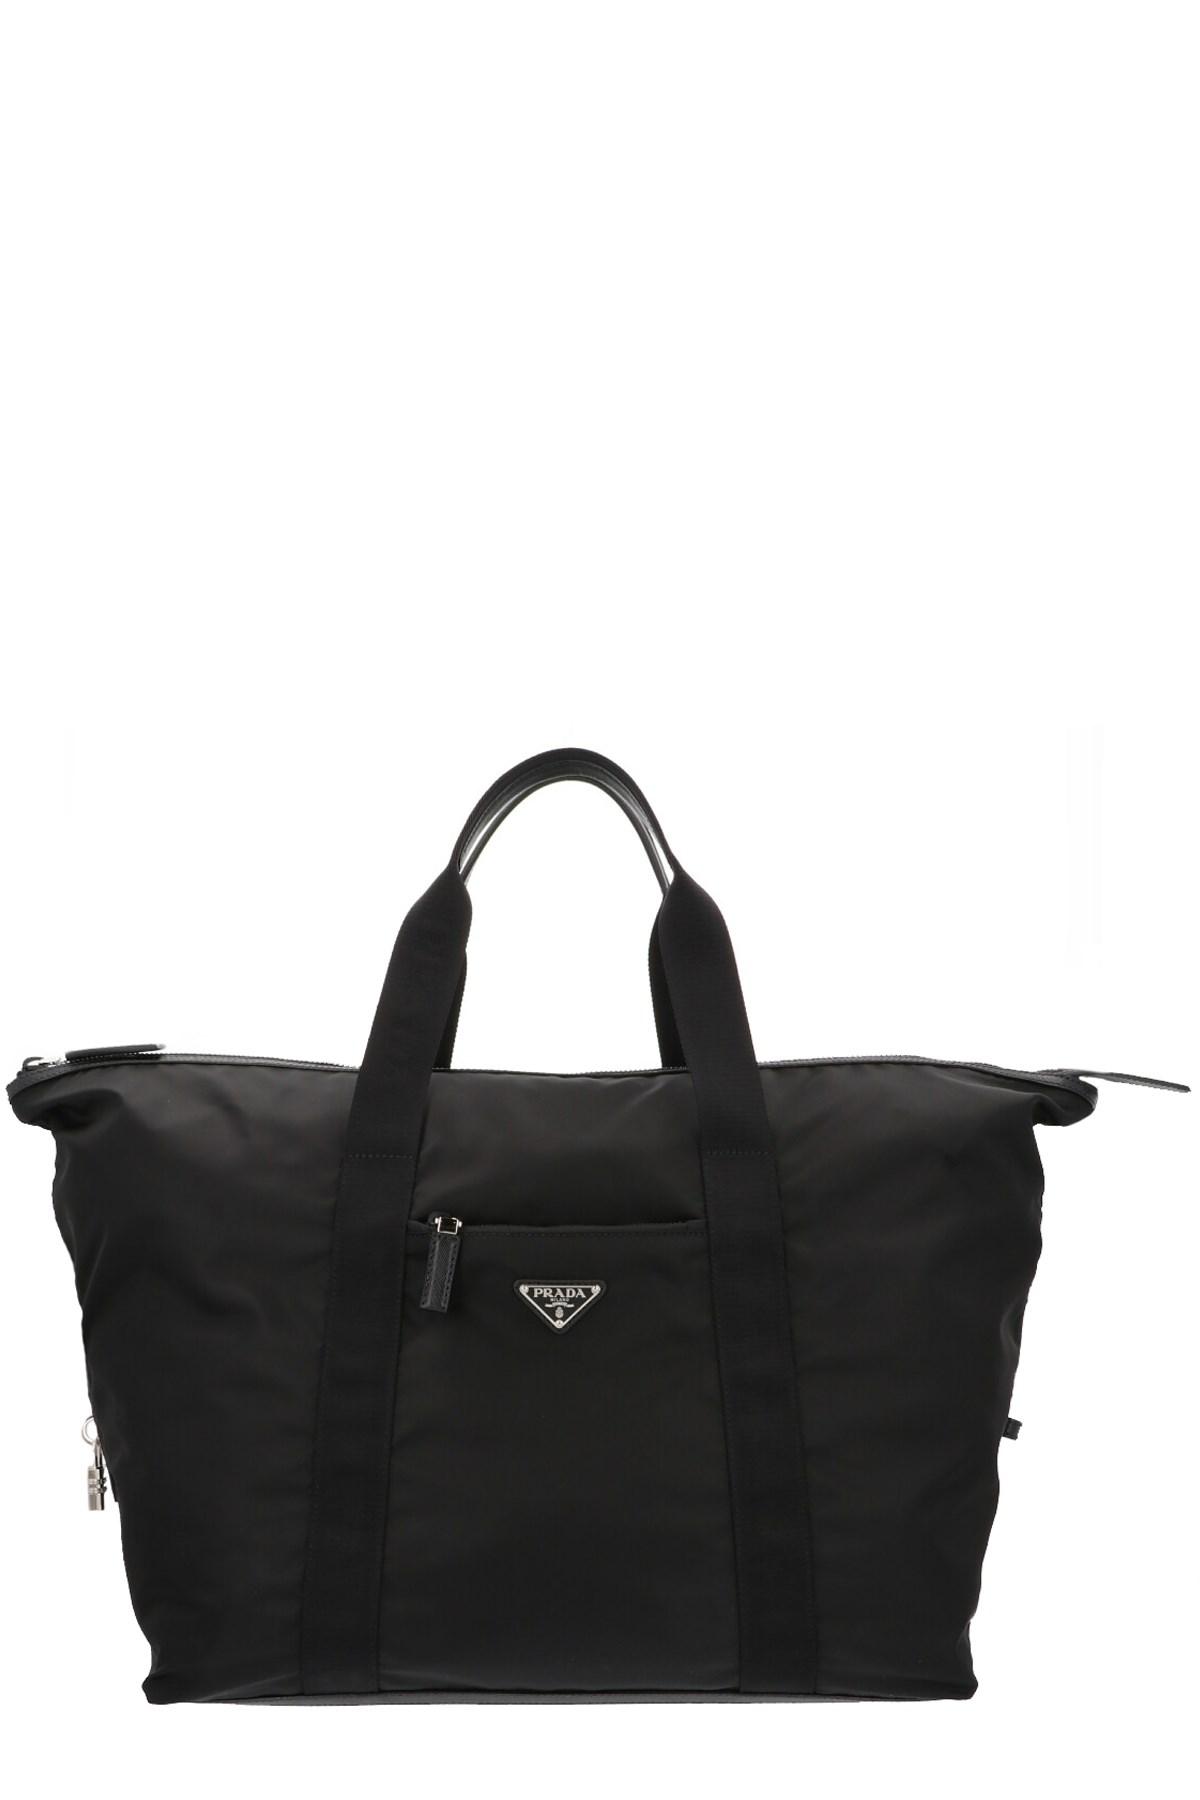 a3eb6932b1ac prada logo travel bag available on julian-fashion.com - 74639